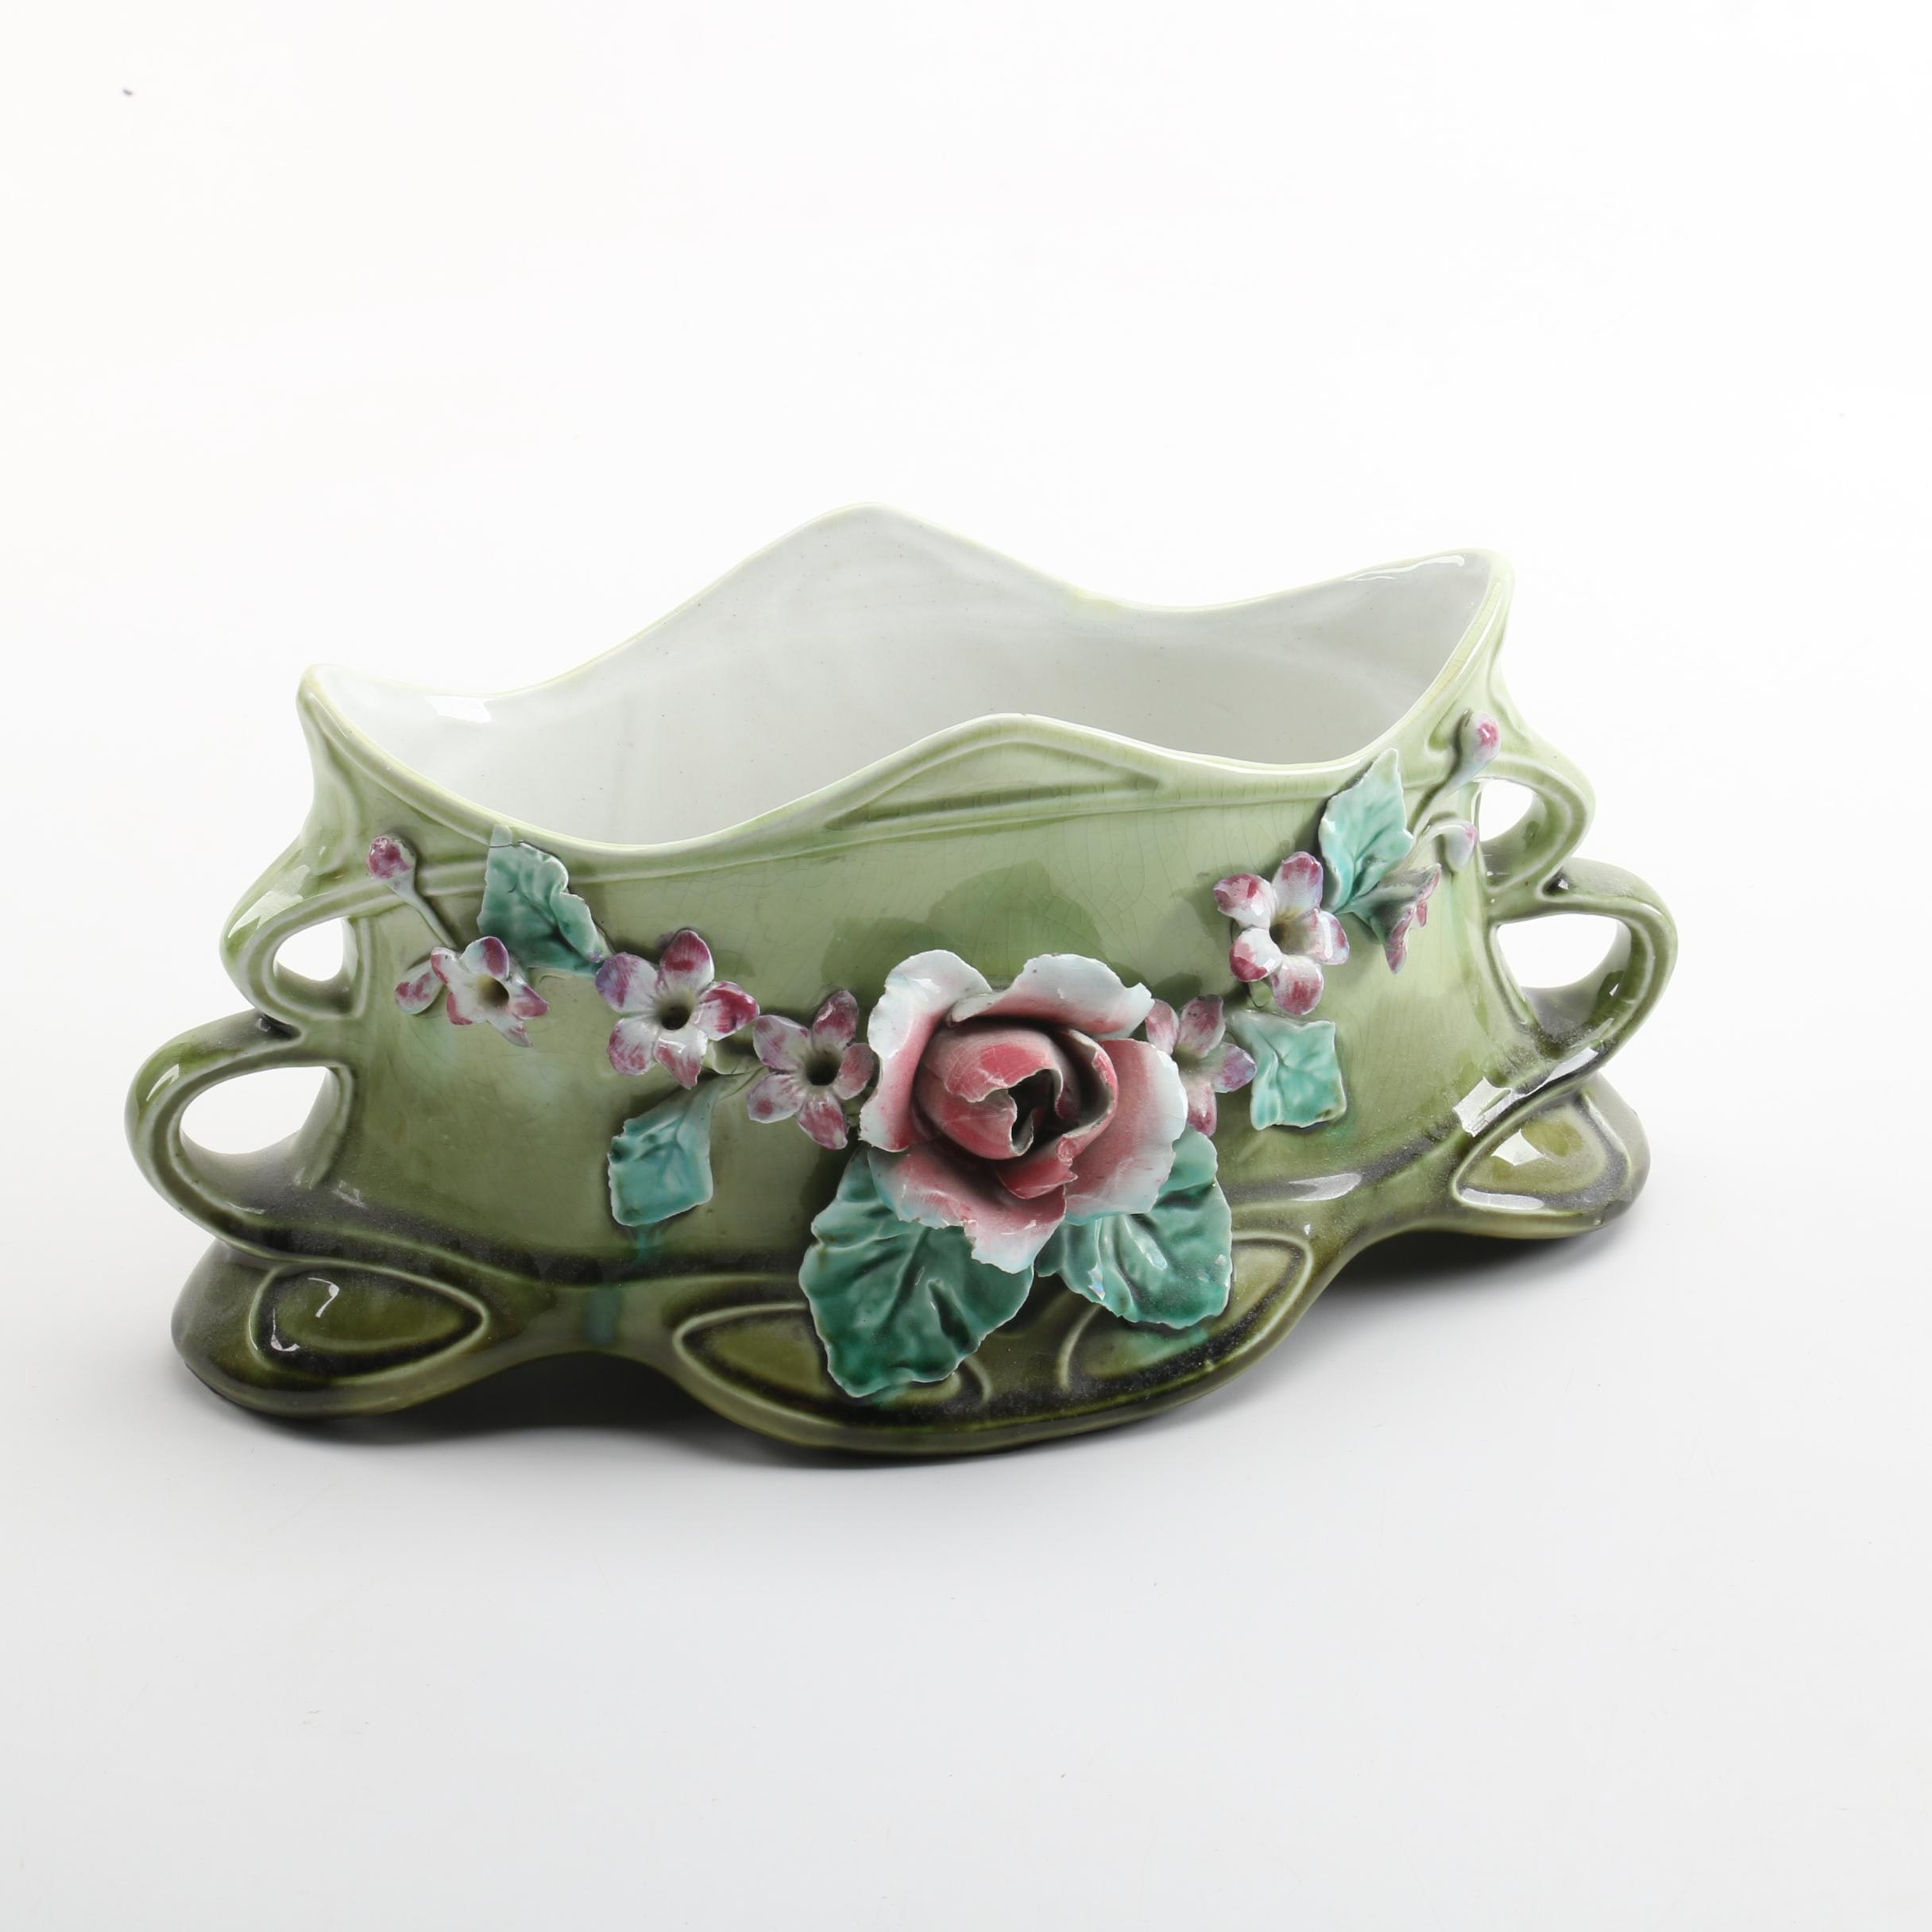 Belgian Porcelain Planter